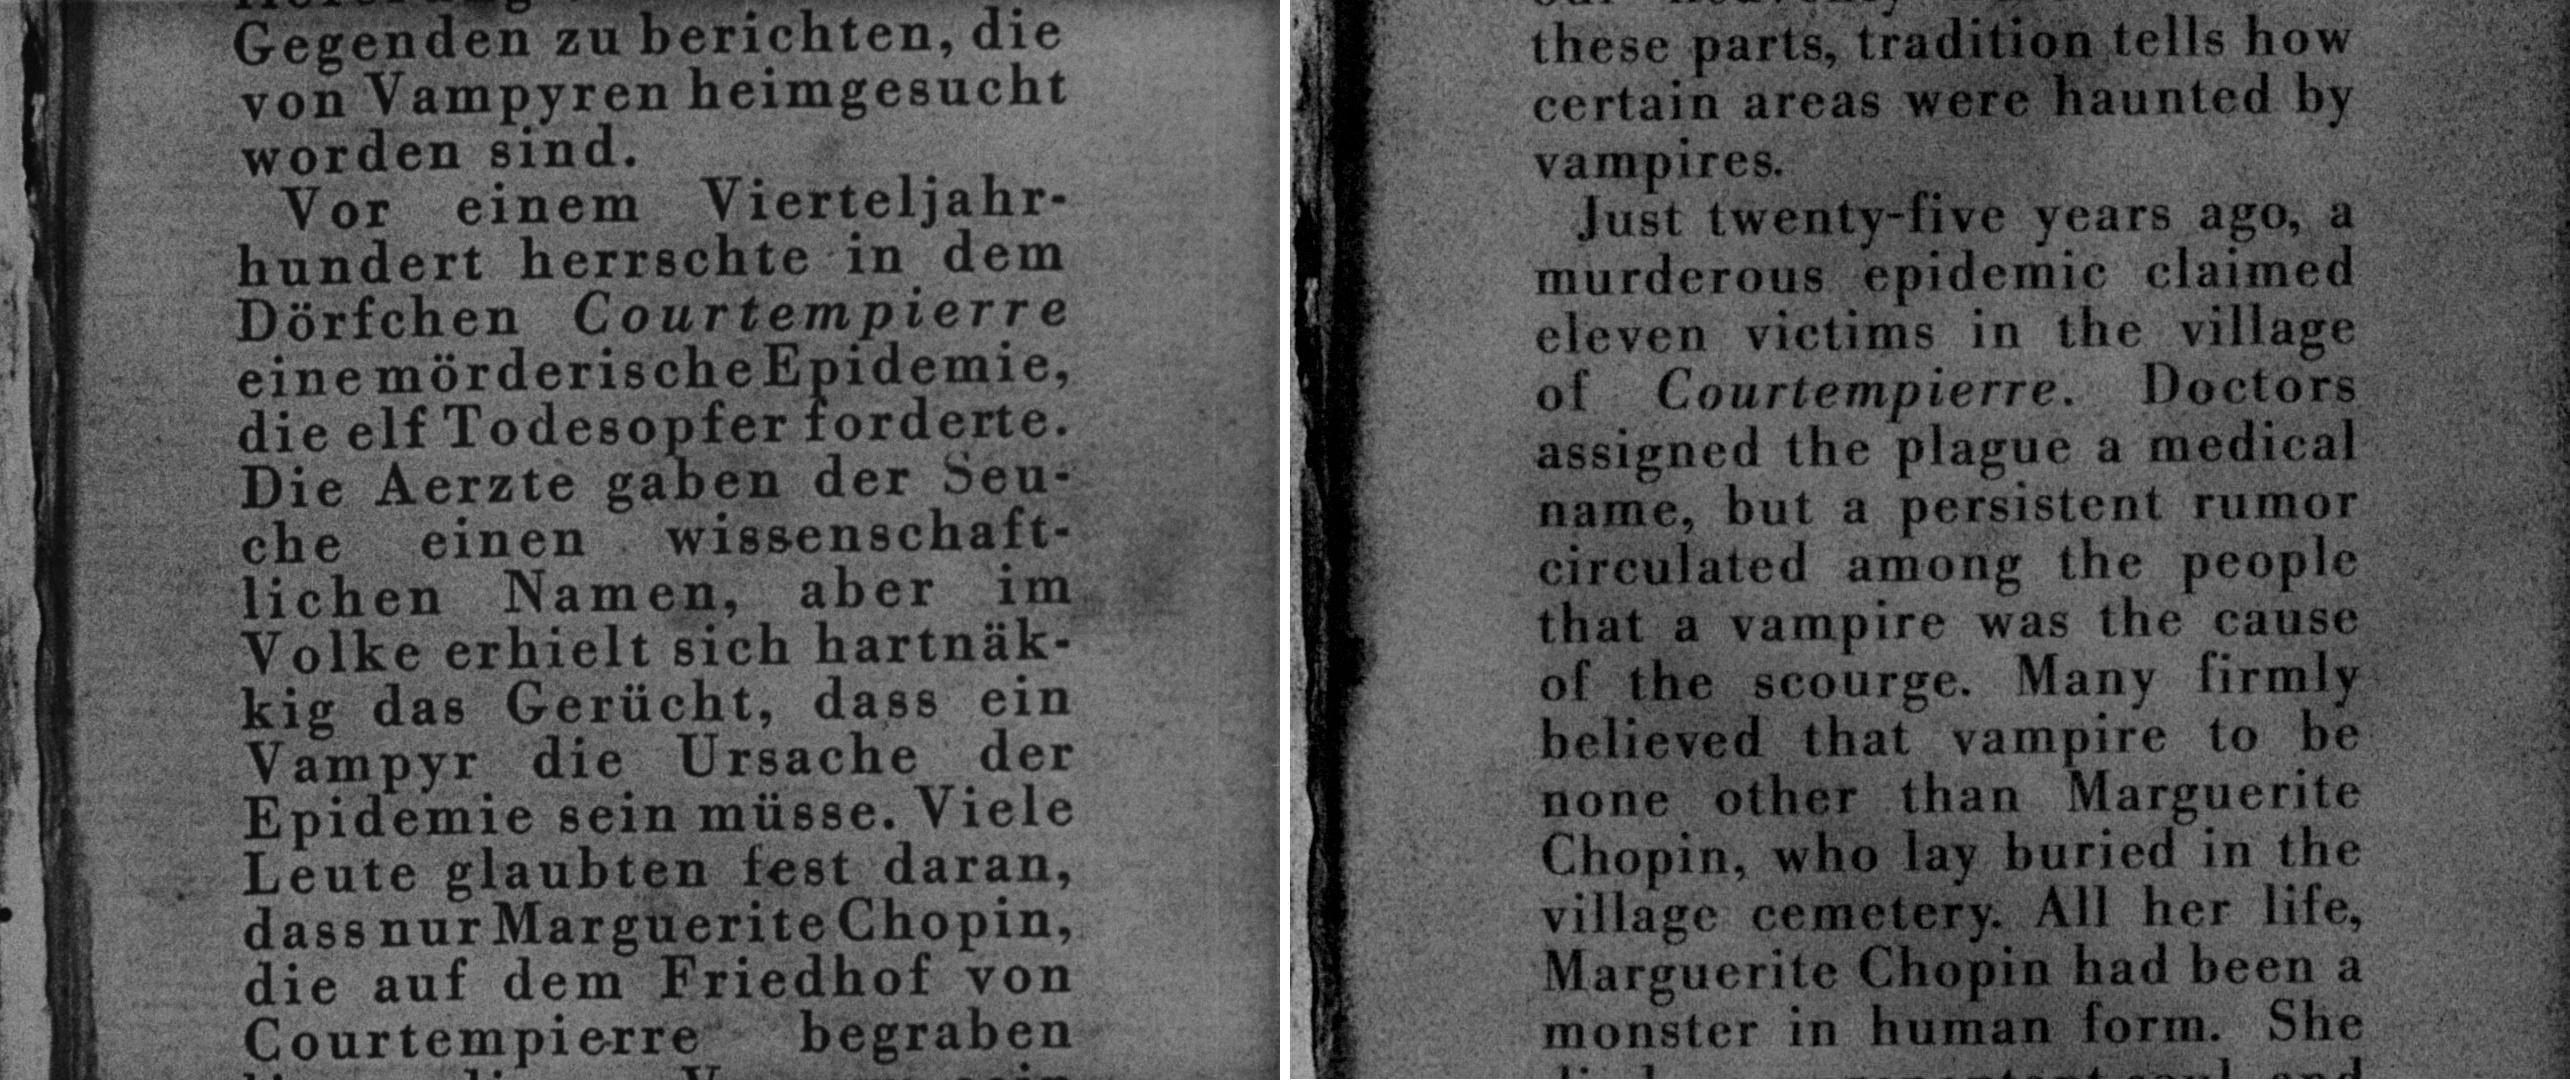 Vampyr - German vs English Book Text Comparison